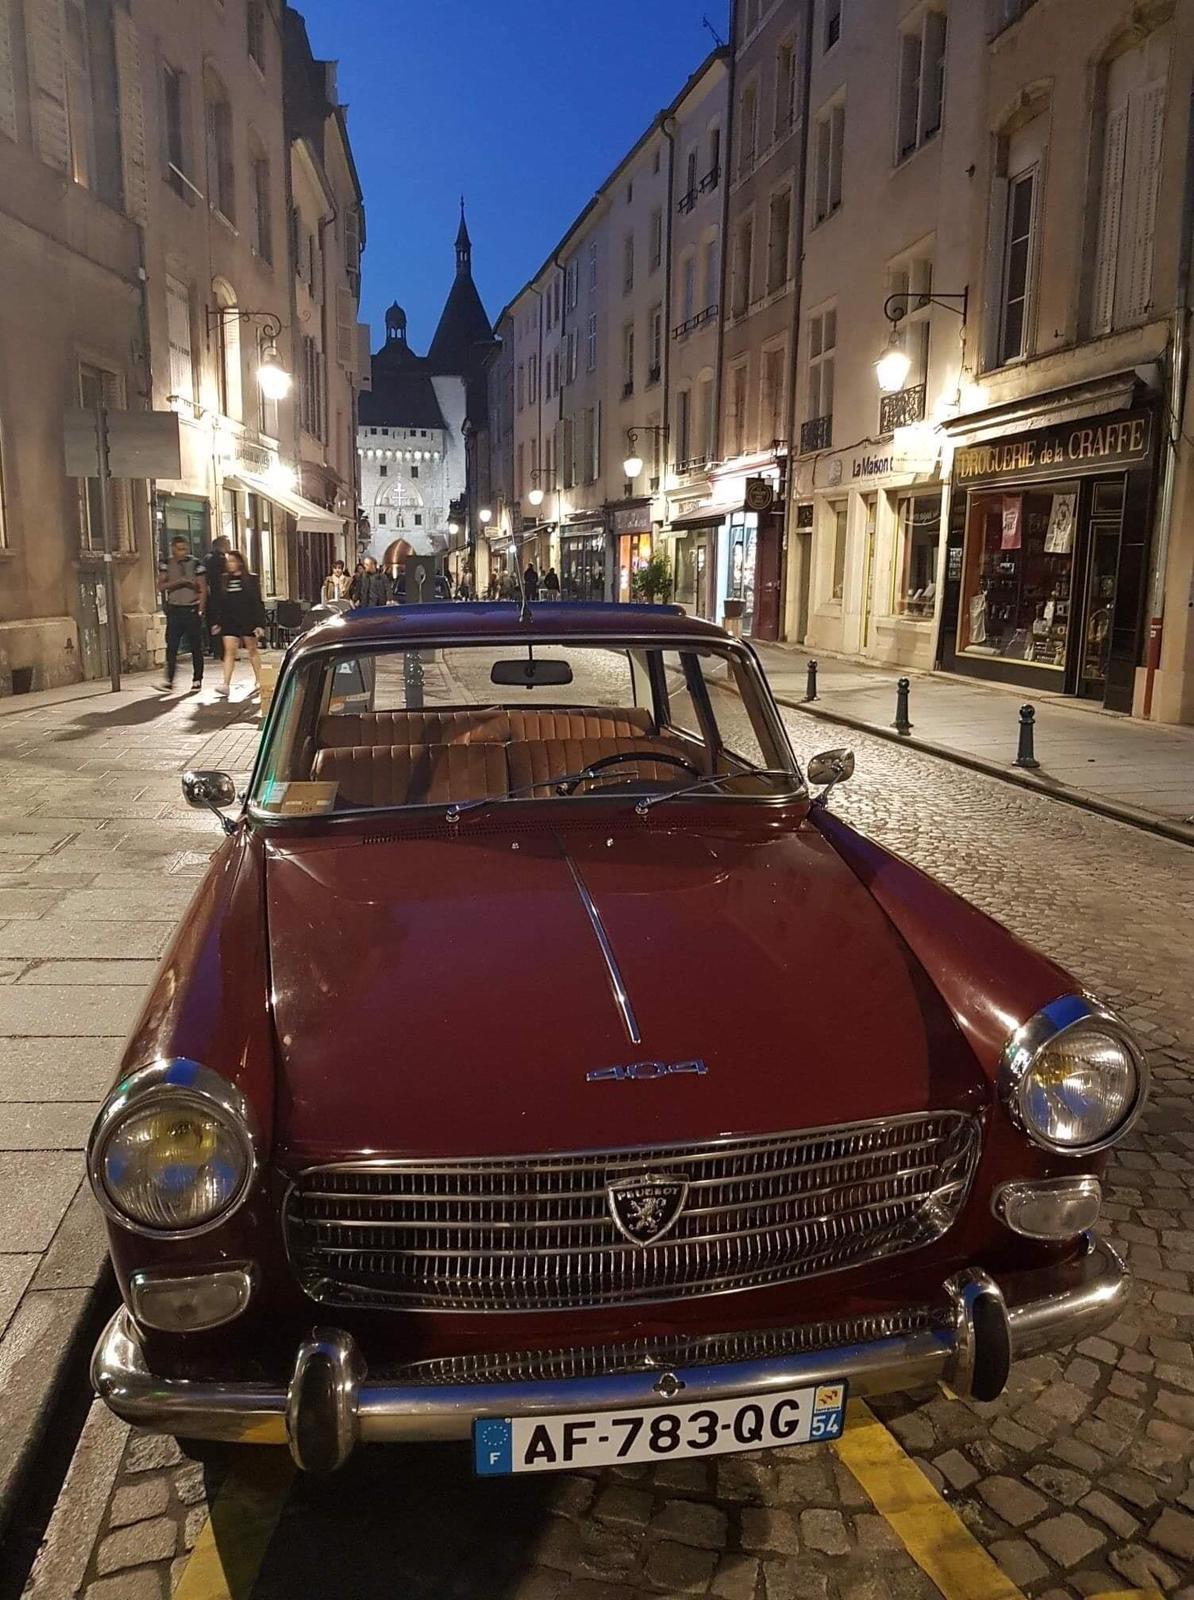 Peugeot 404 https://t.co/CIesm0yPok